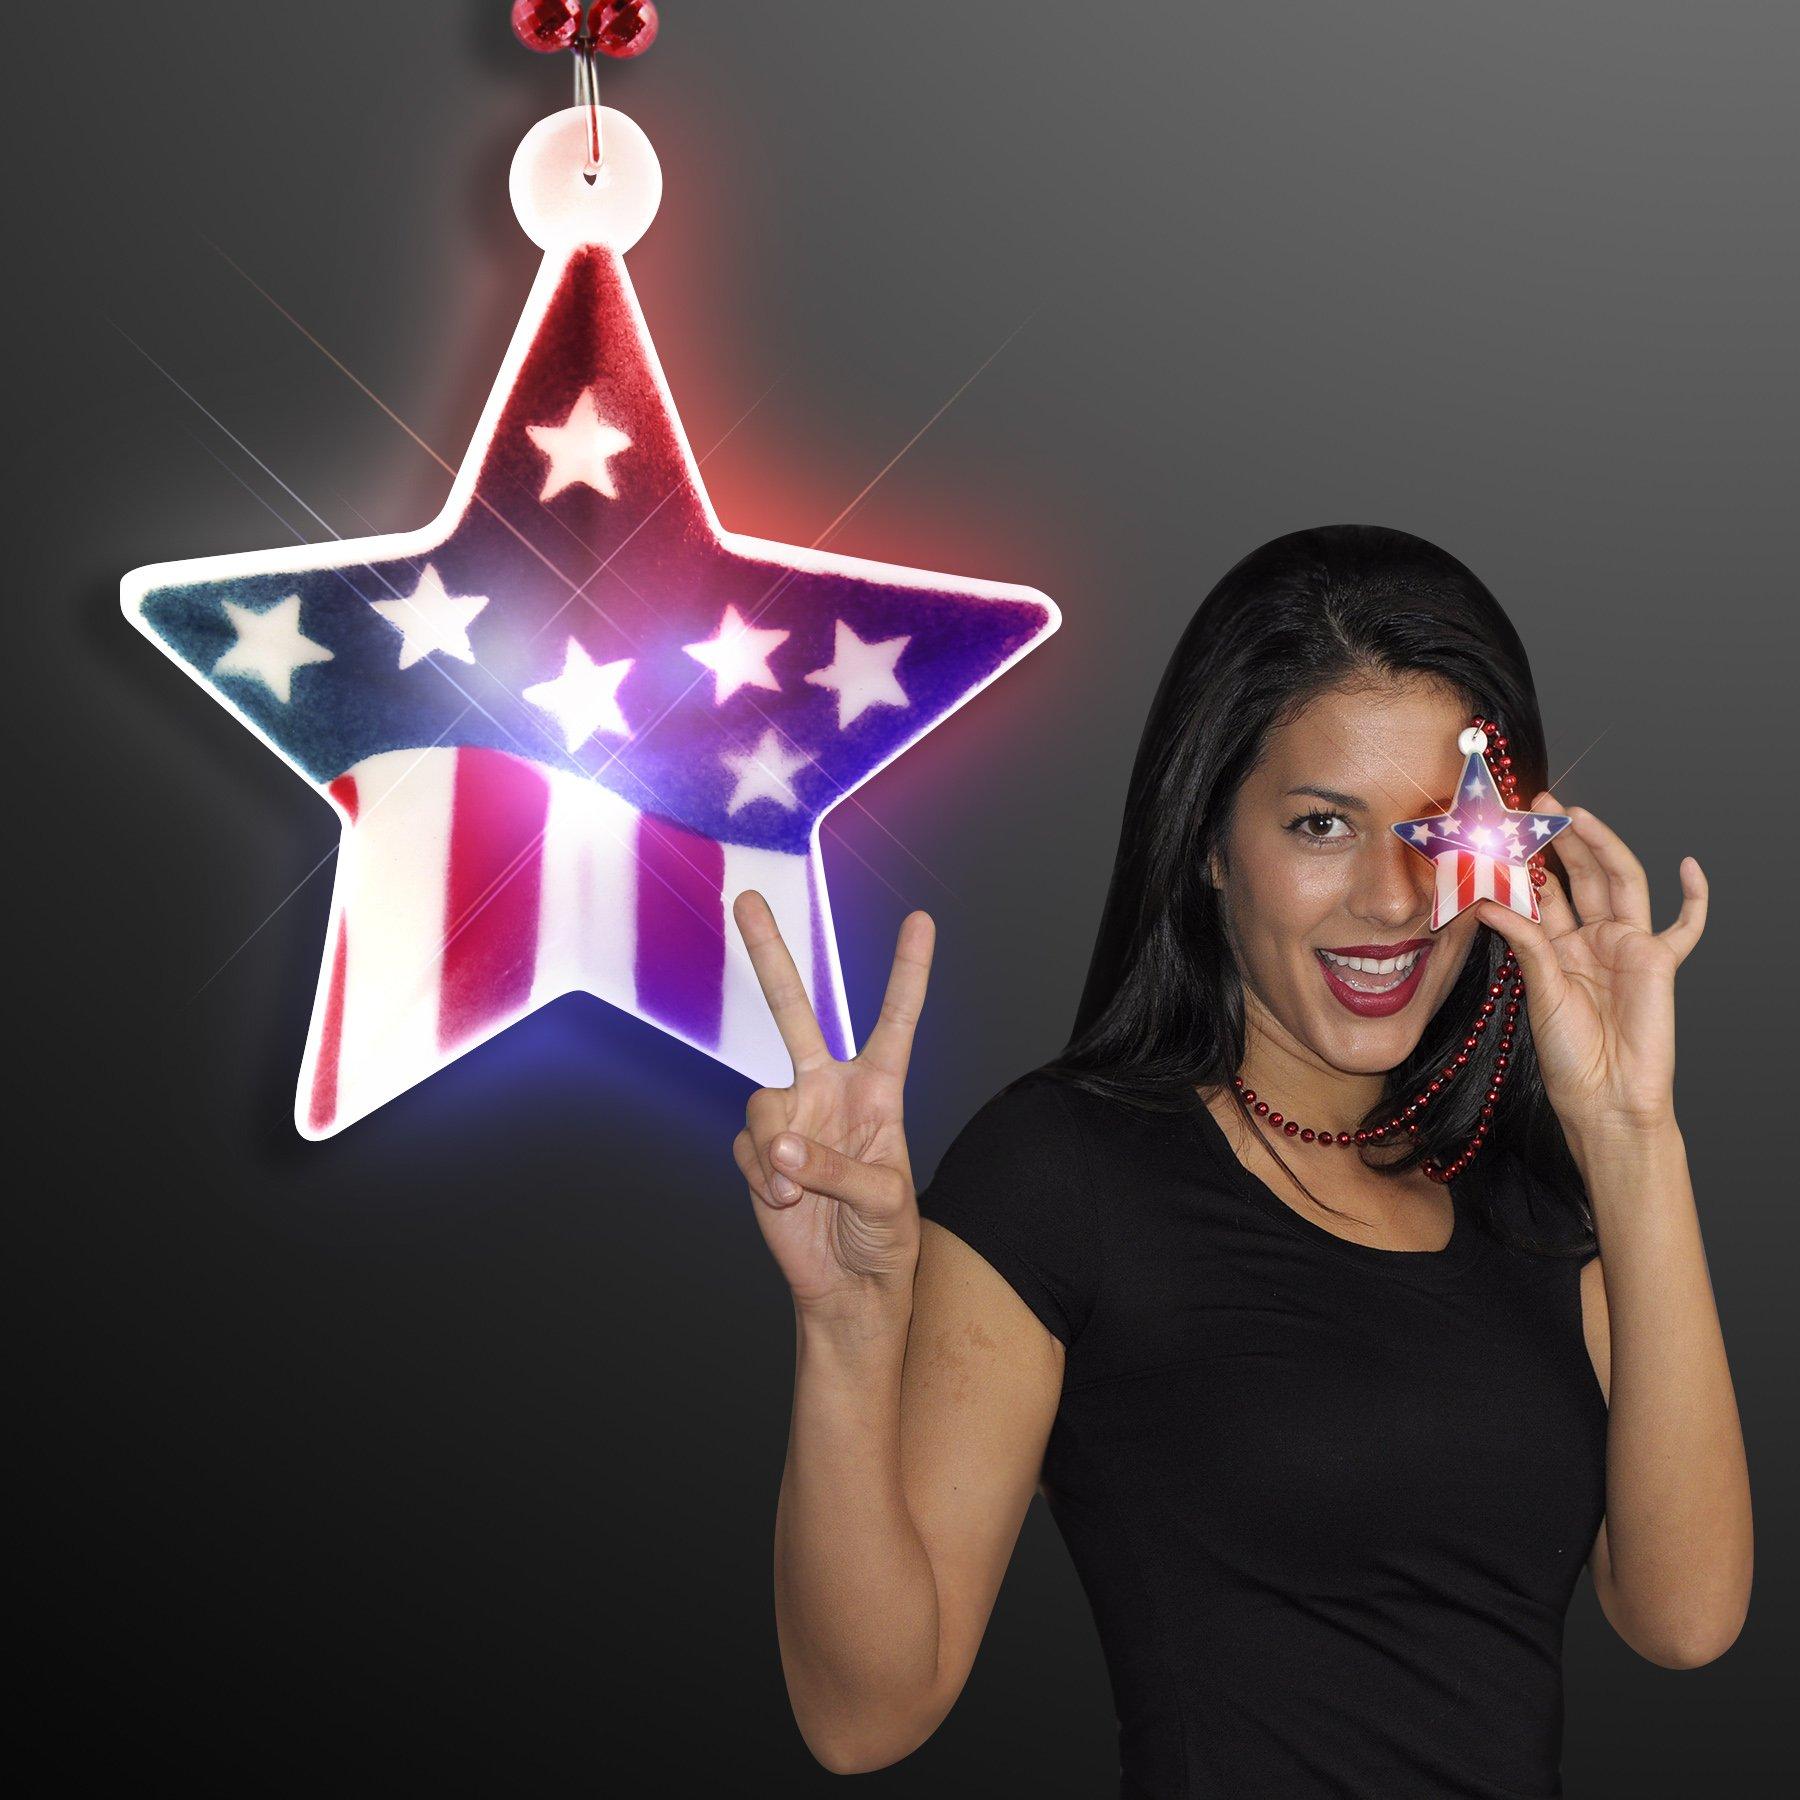 FlashingBlinkyLights Light Up American Flag Star on Mardi Gras Bead Necklace (Set of 12)